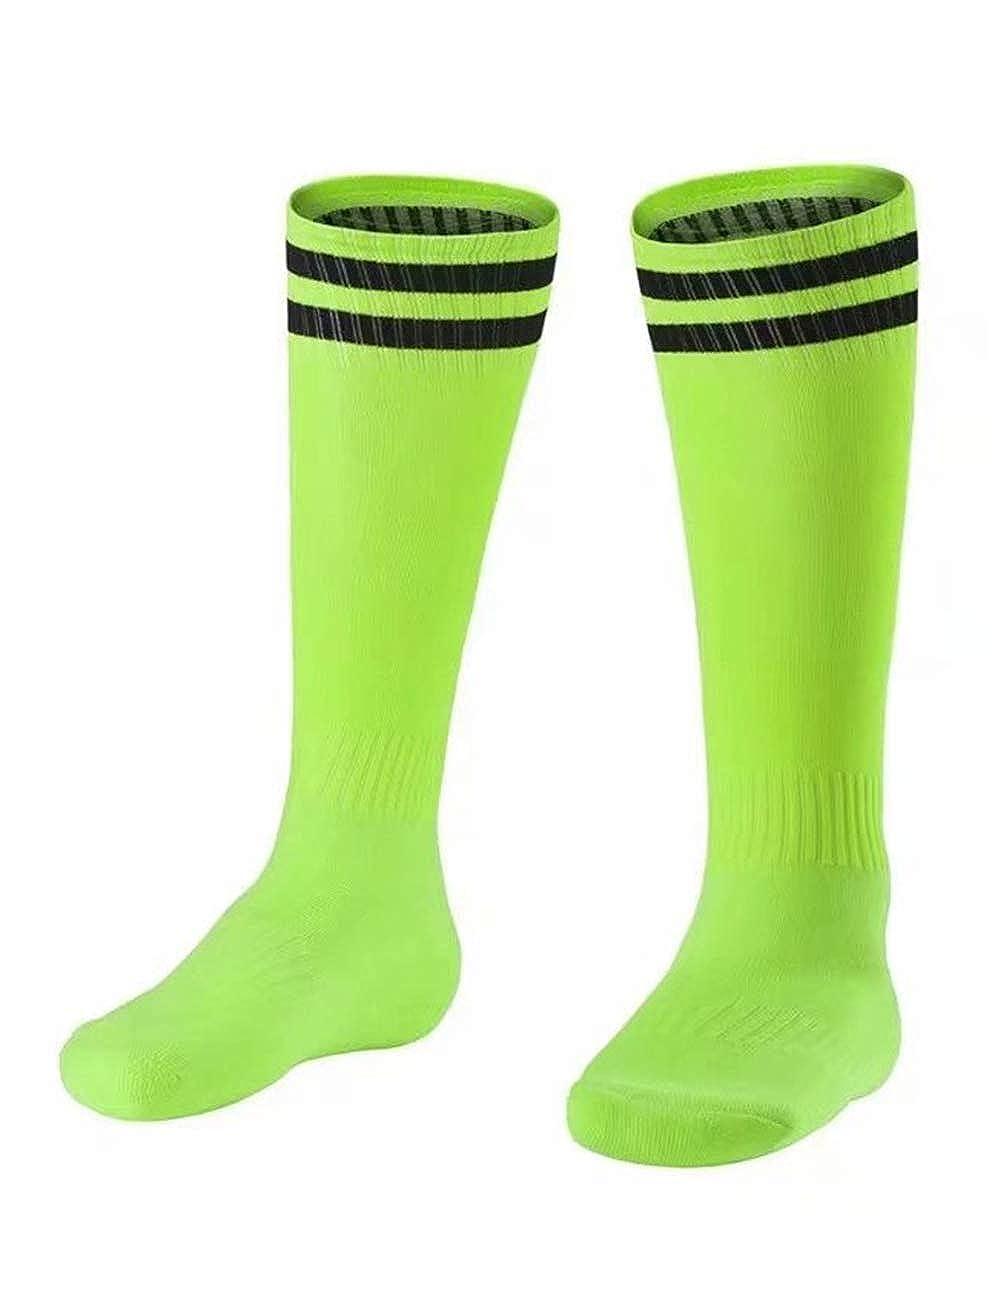 besbomig Boys Football Tracksuits Kids Breathable Sports Uniform Jerseys Short Sleeve T-Shirts /& Shorts /& 1pair High Knee Socks Teamswear Sets